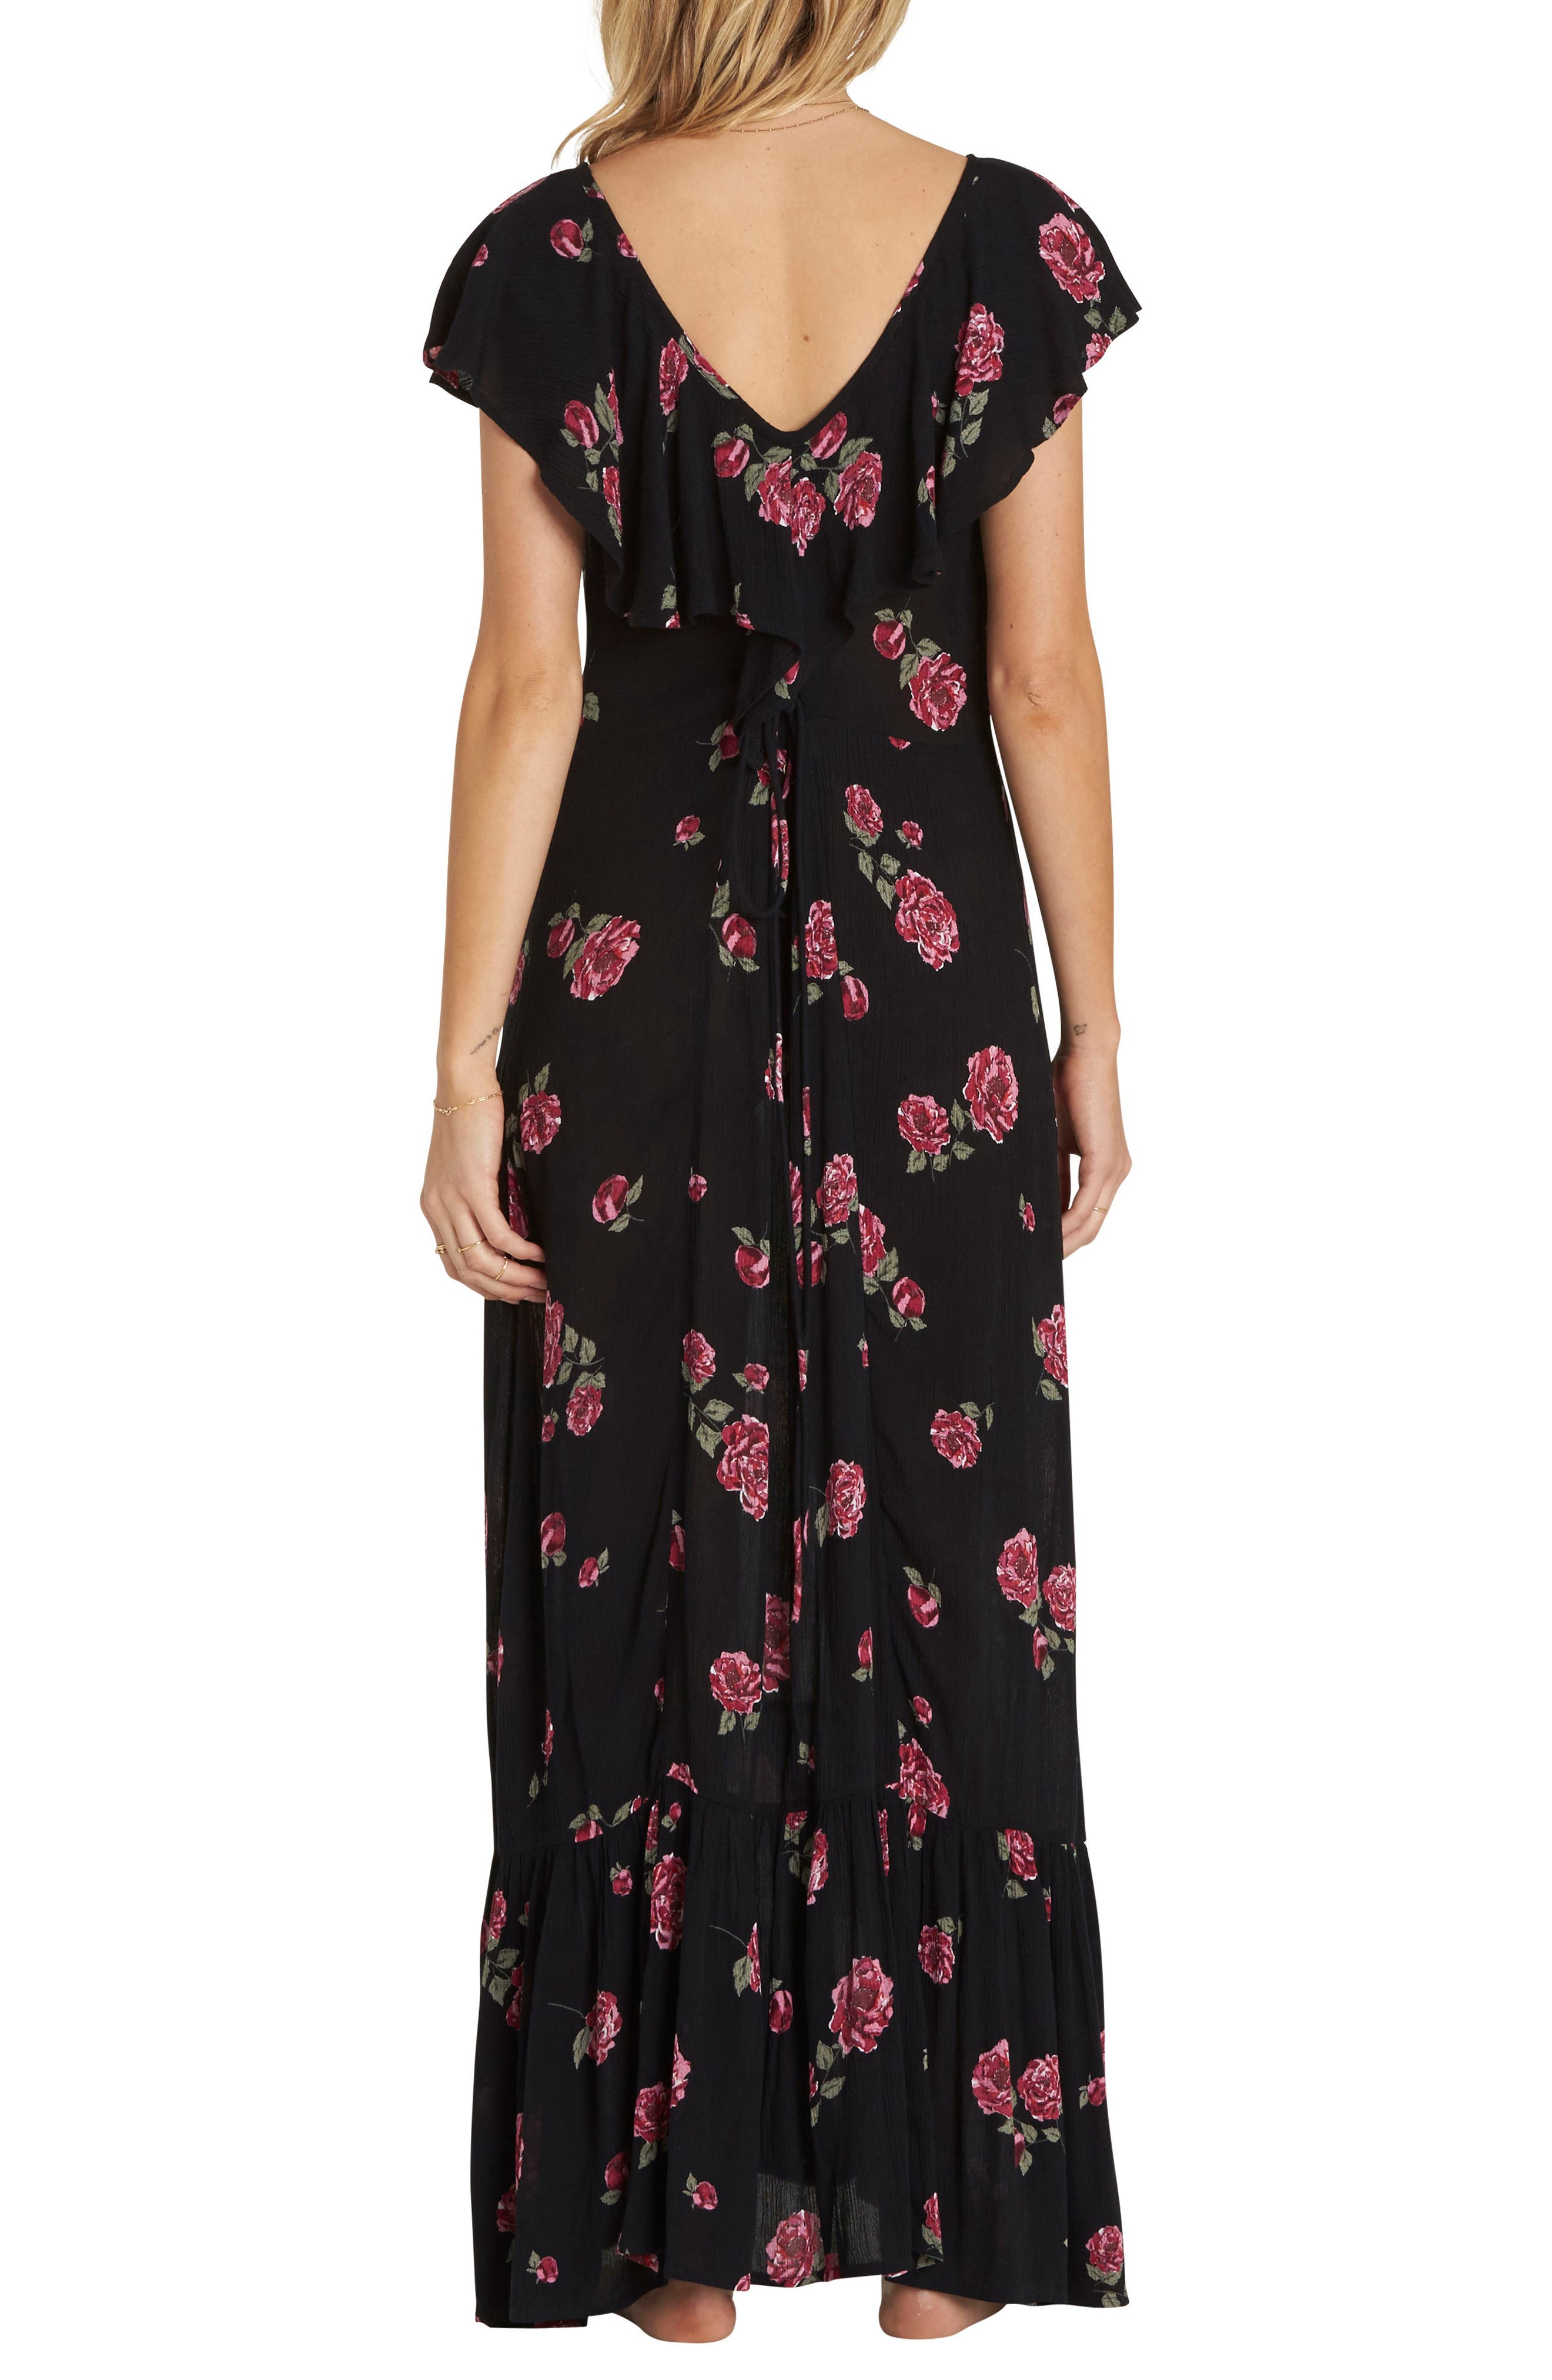 Southern Border Ruffled Maxi Dress,                             Alternate thumbnail 2, color,